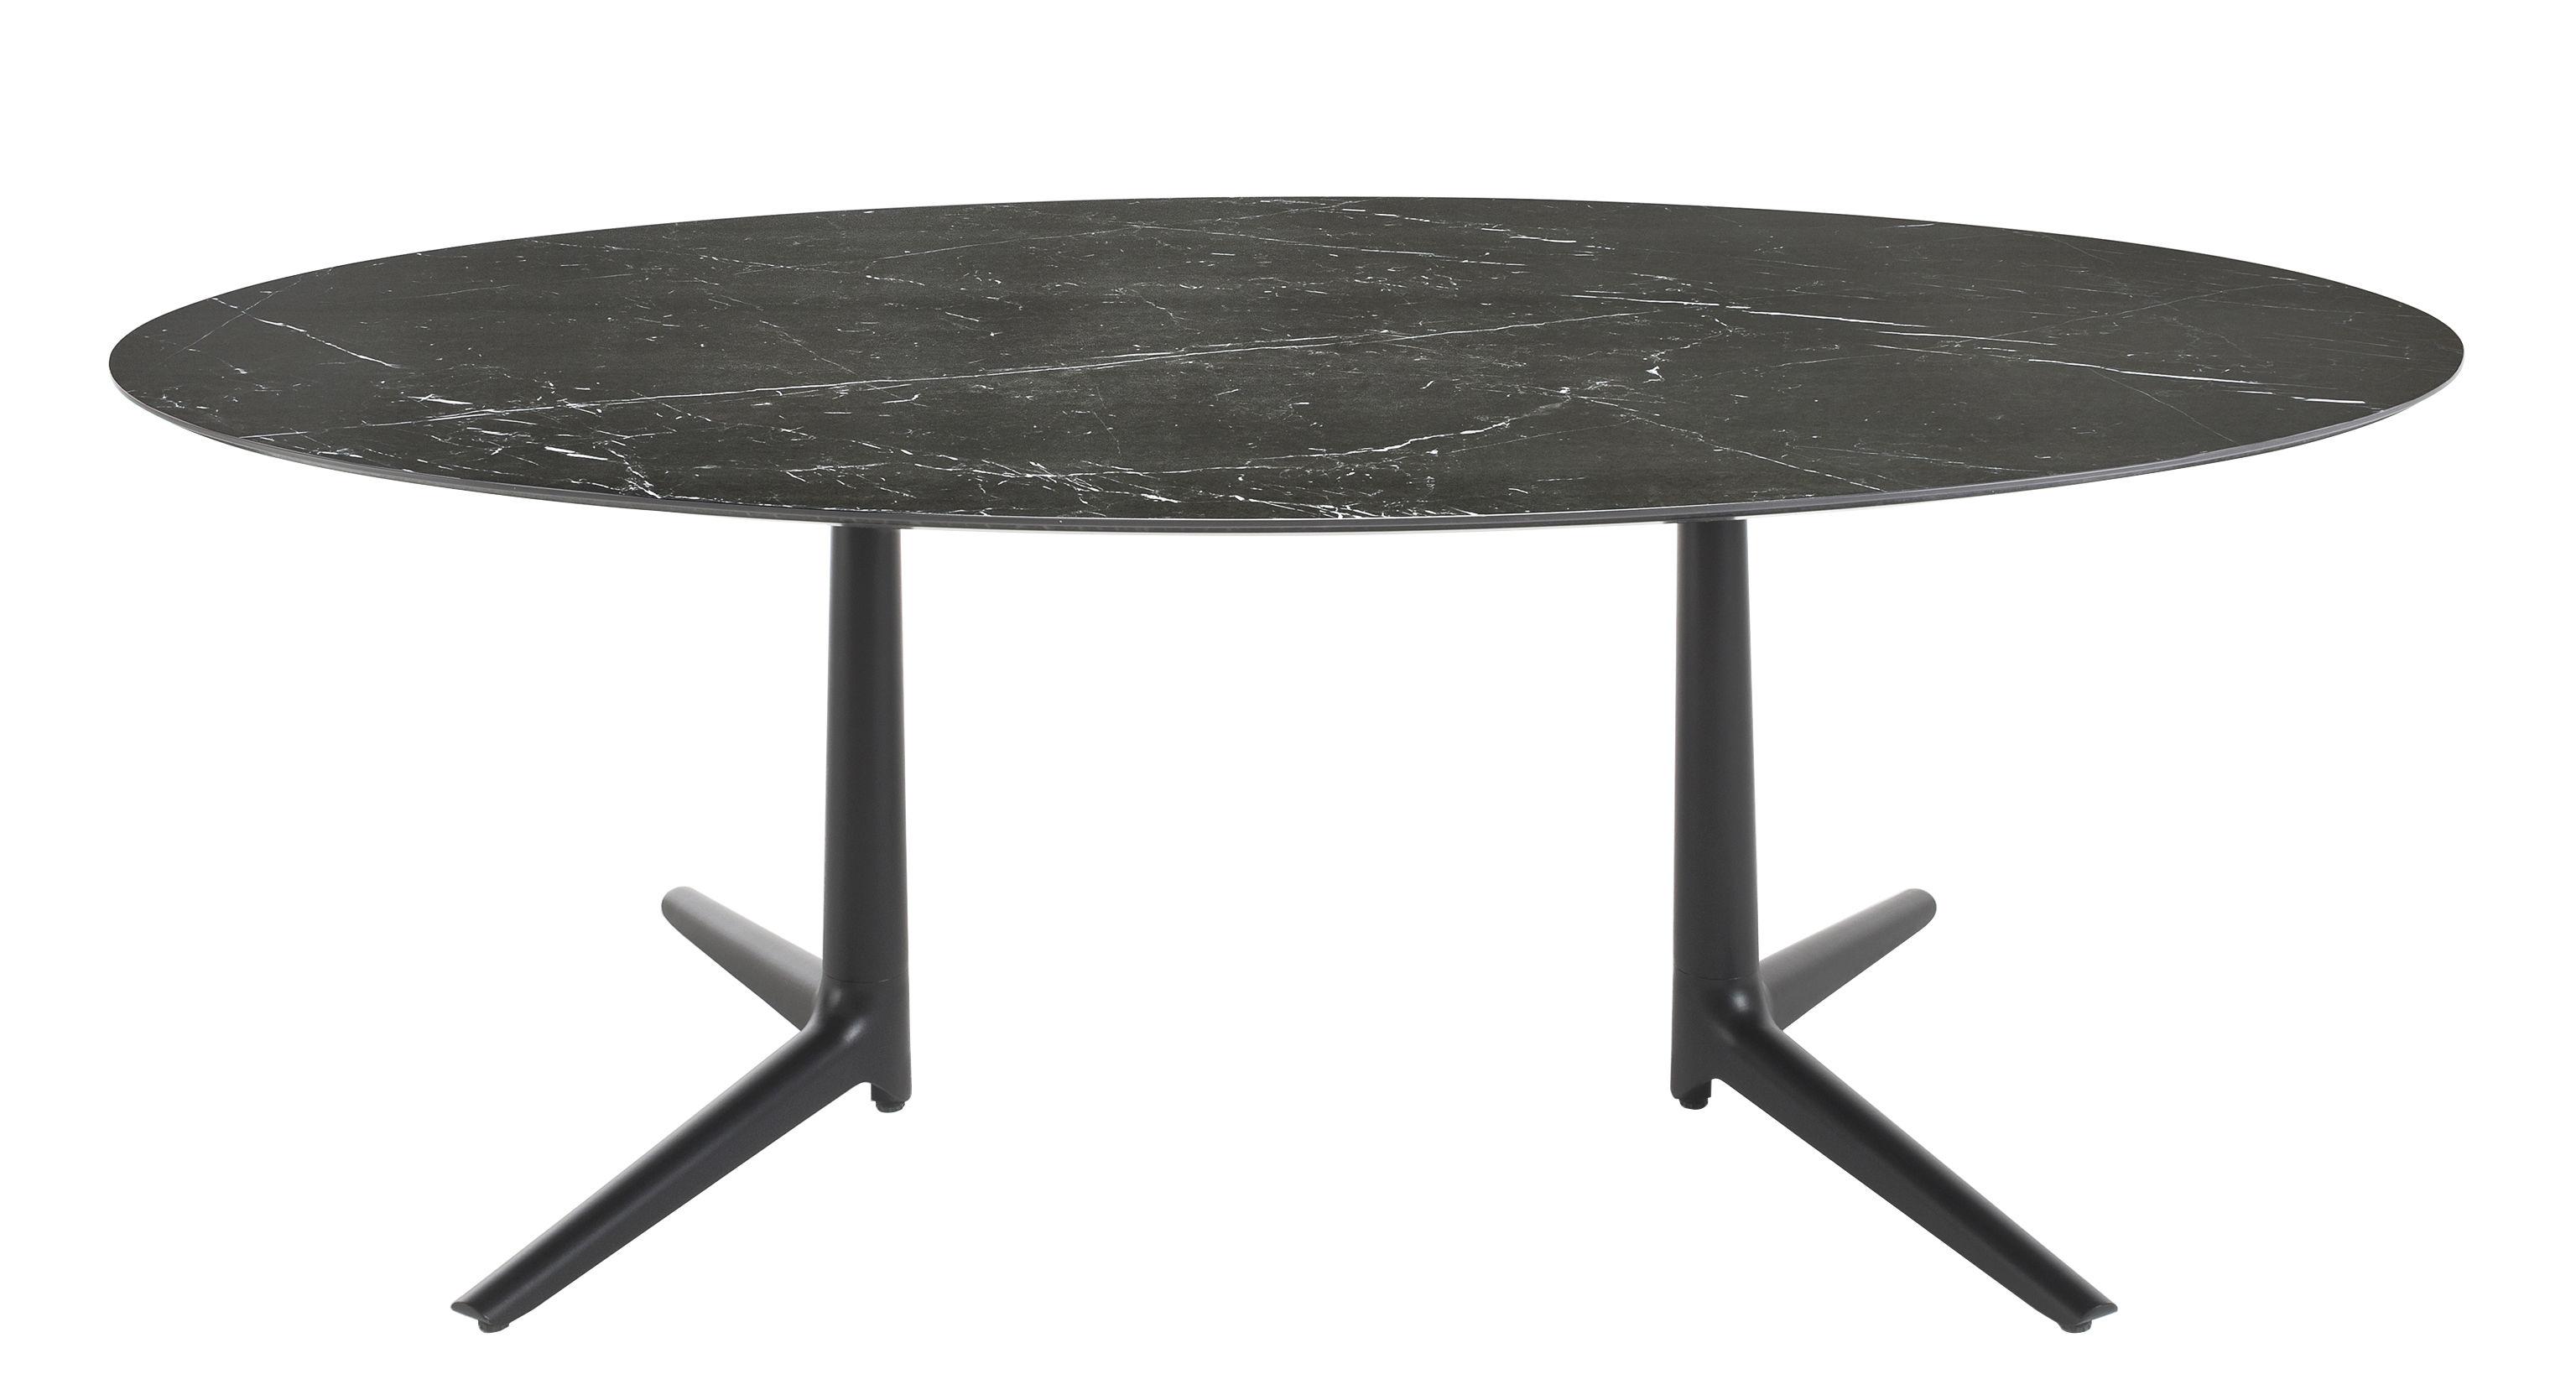 Mobilier - Tables - Table Multiplo indoor - Effet marbre / 192 x 118 cm - Kartell - Noir - Aluminium verni, Grès cérame effet marbre